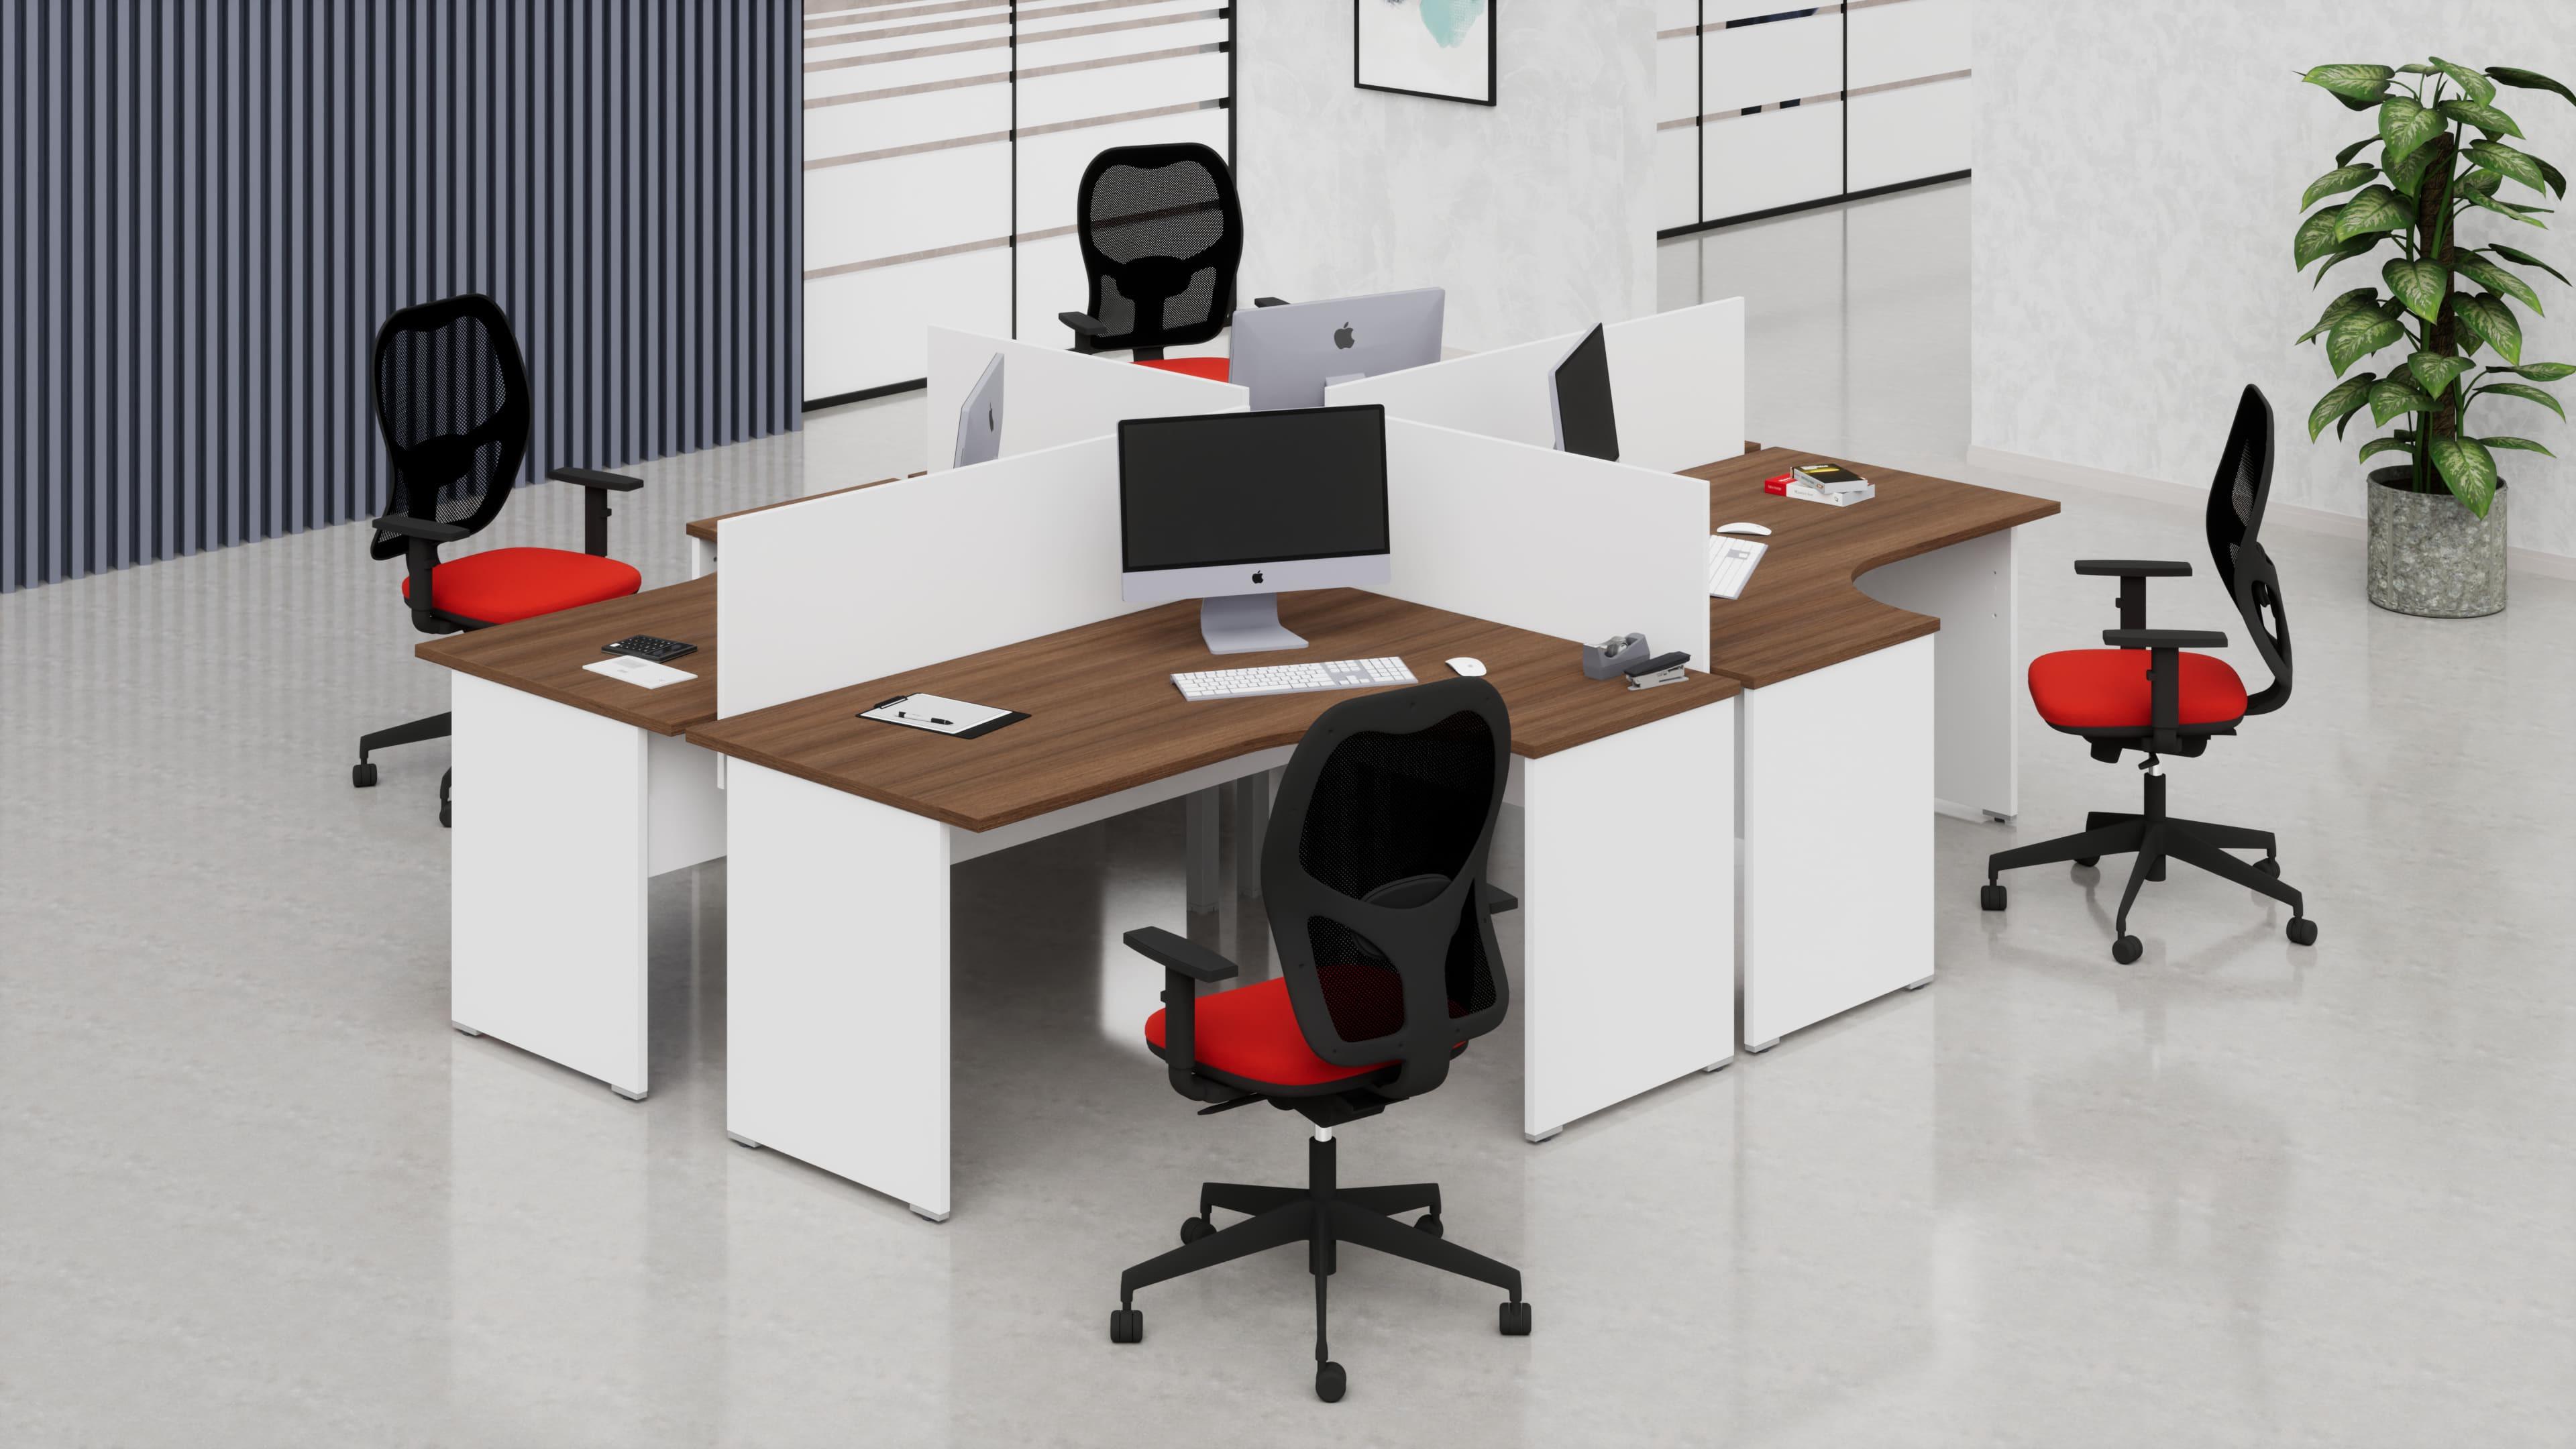 Scrivanie workstation simmetriche 4 postazioni